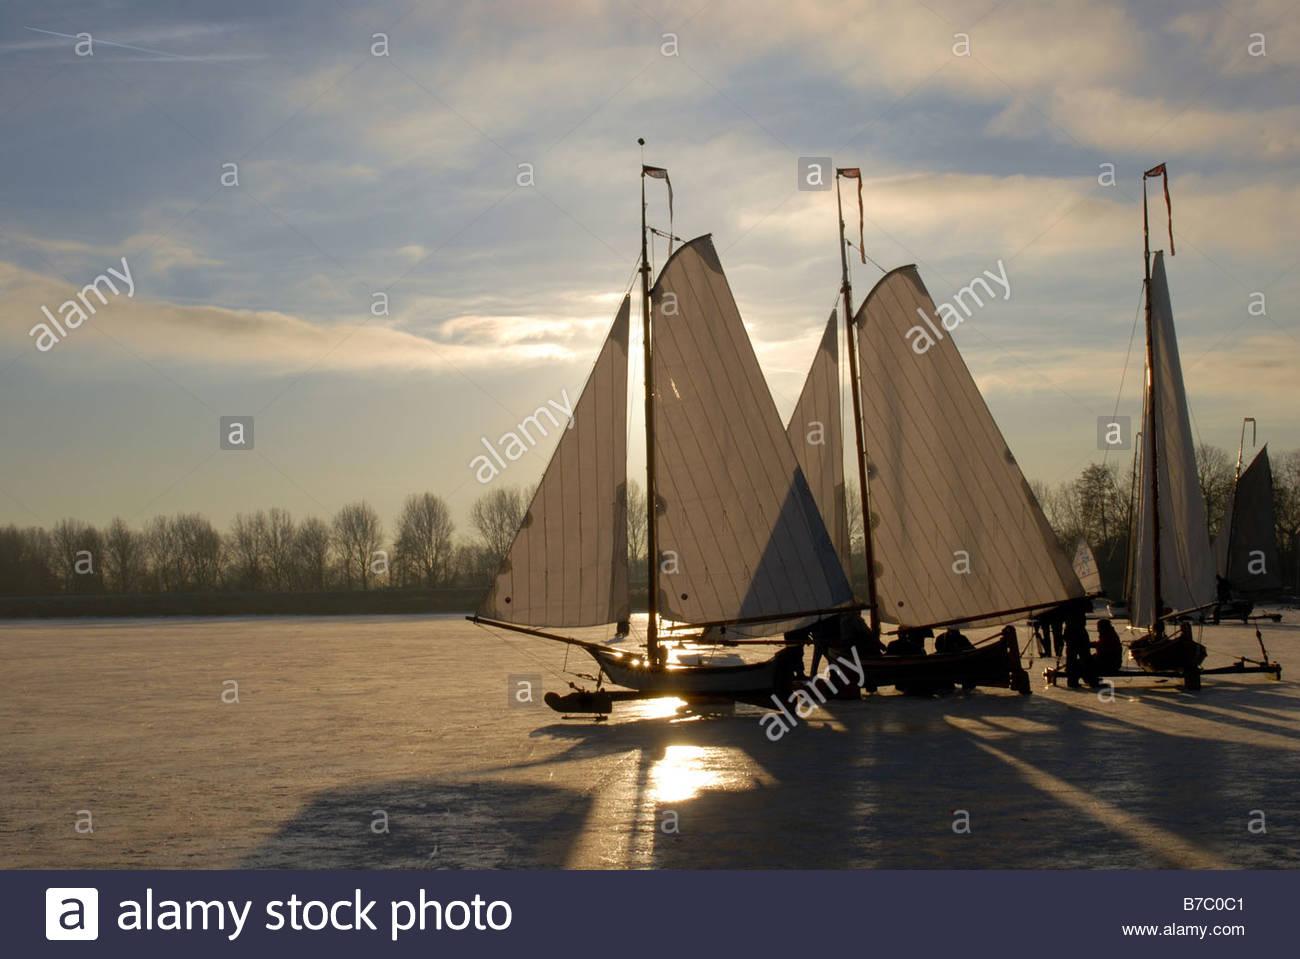 monnickendam-the-netherlands-iceyachts-on-the-gouwzee-B7C0C1.jpg